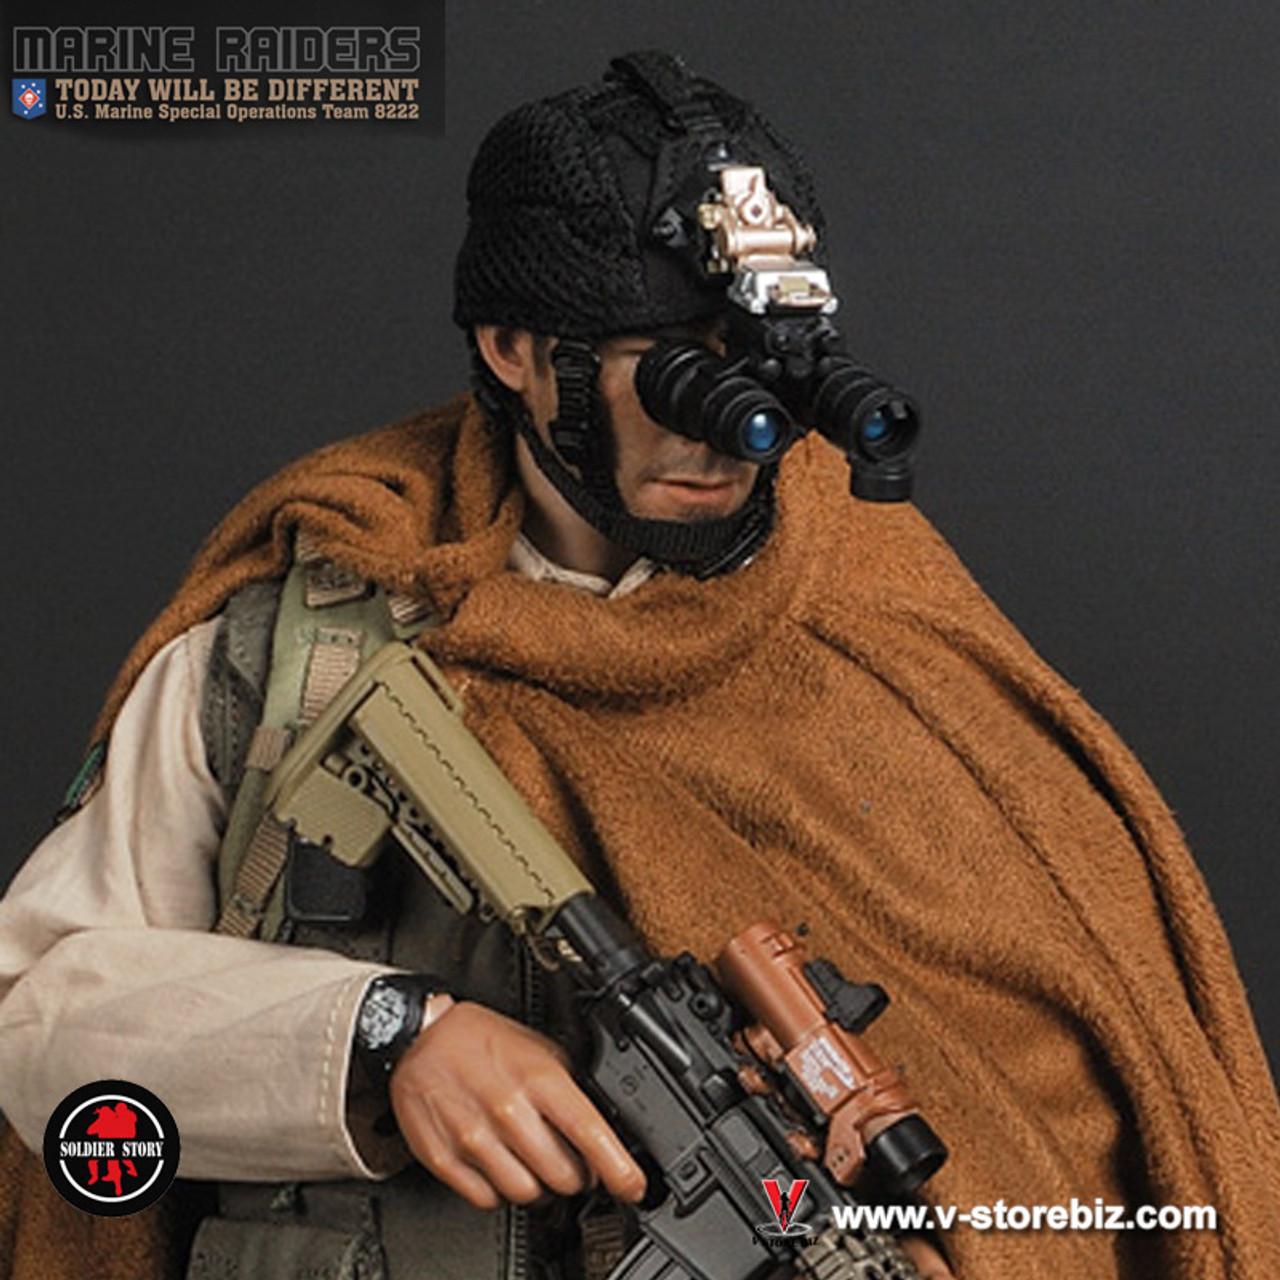 1//6 scale Soldier Story US Marine Raiders MSOT 8222 Camo BTU Uniform Shirt